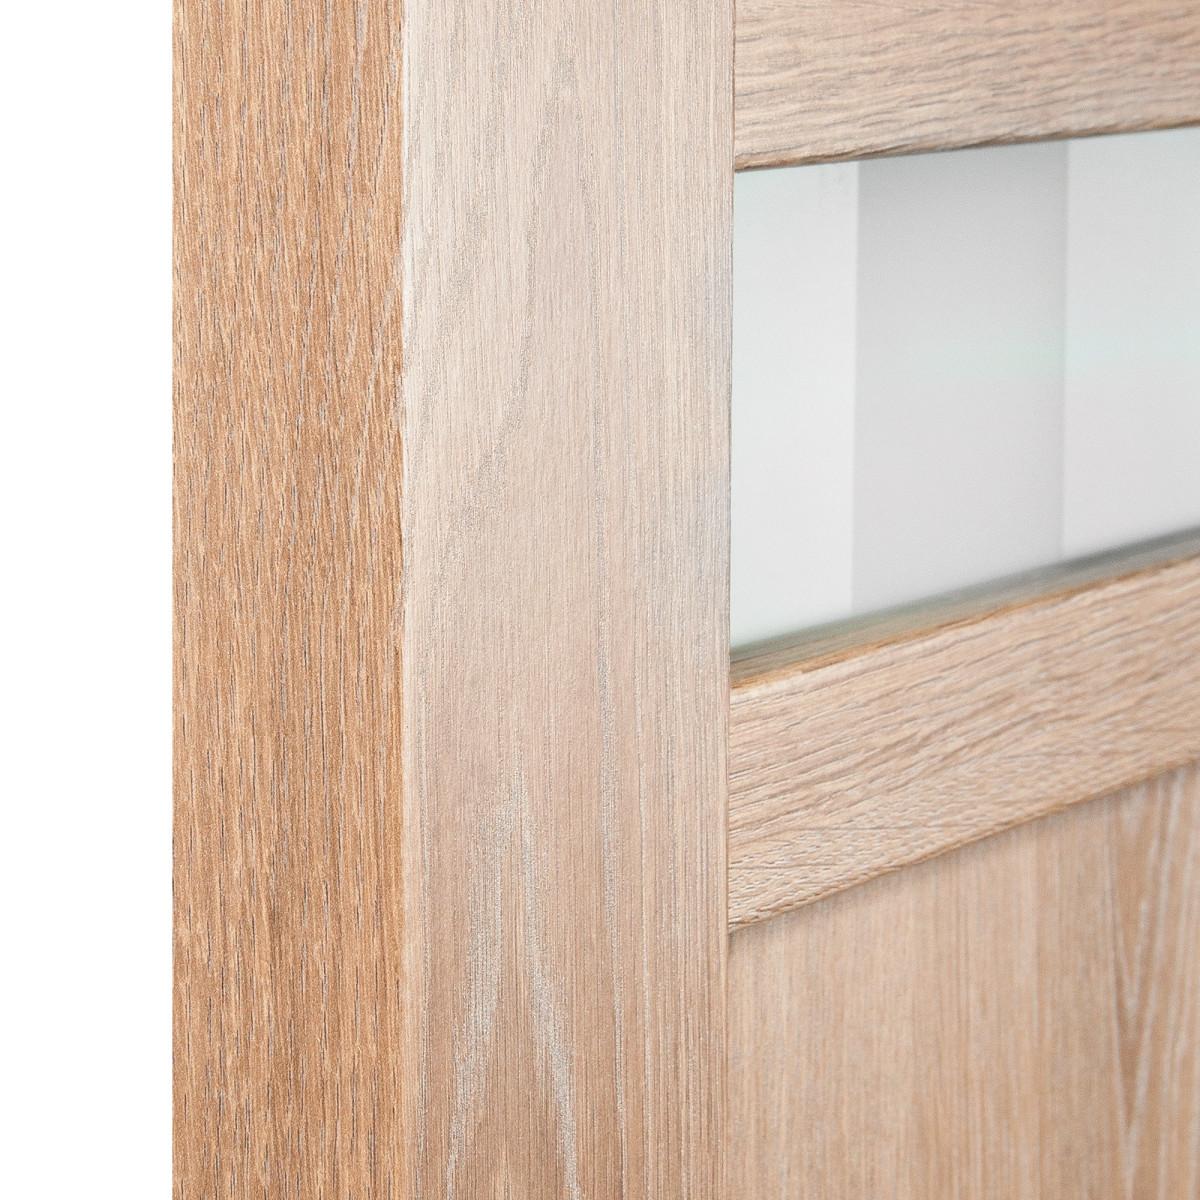 Дверь Межкомнатная Глухая Риволо 70x200 Цвет Натуральный Дуб